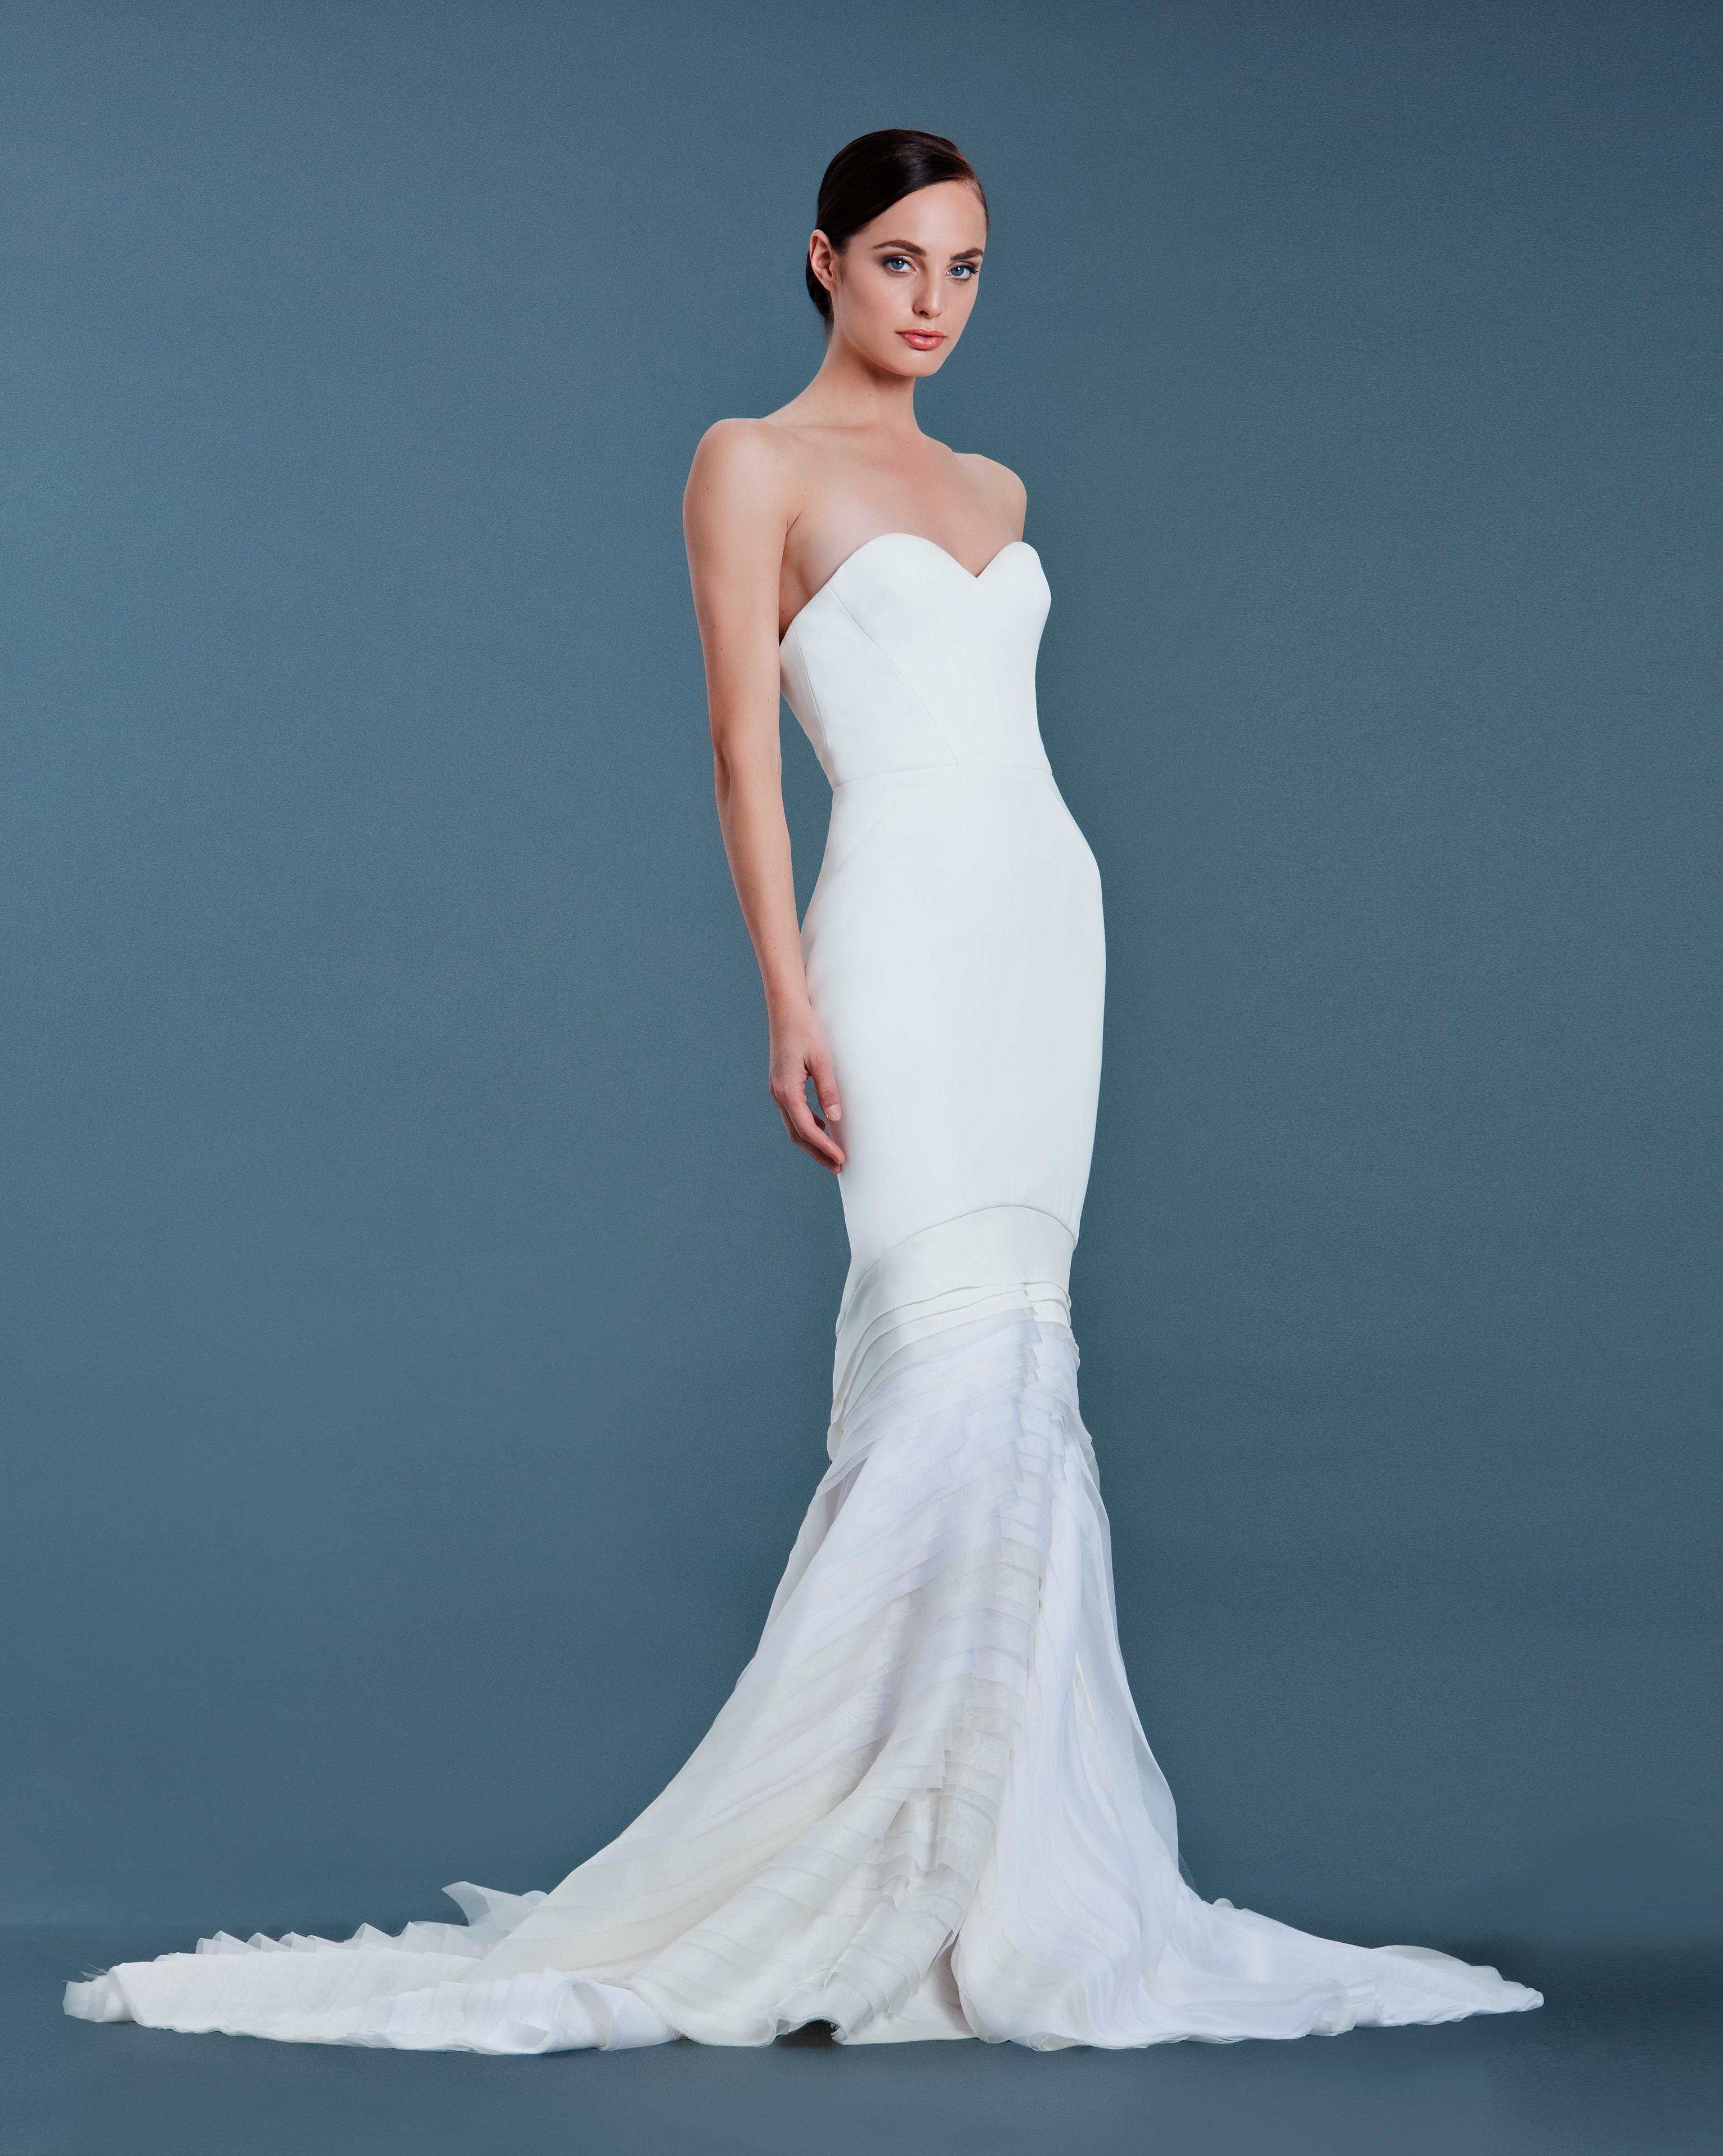 jmendel-fall2016-wedding-dress-10-adrienne.jpg